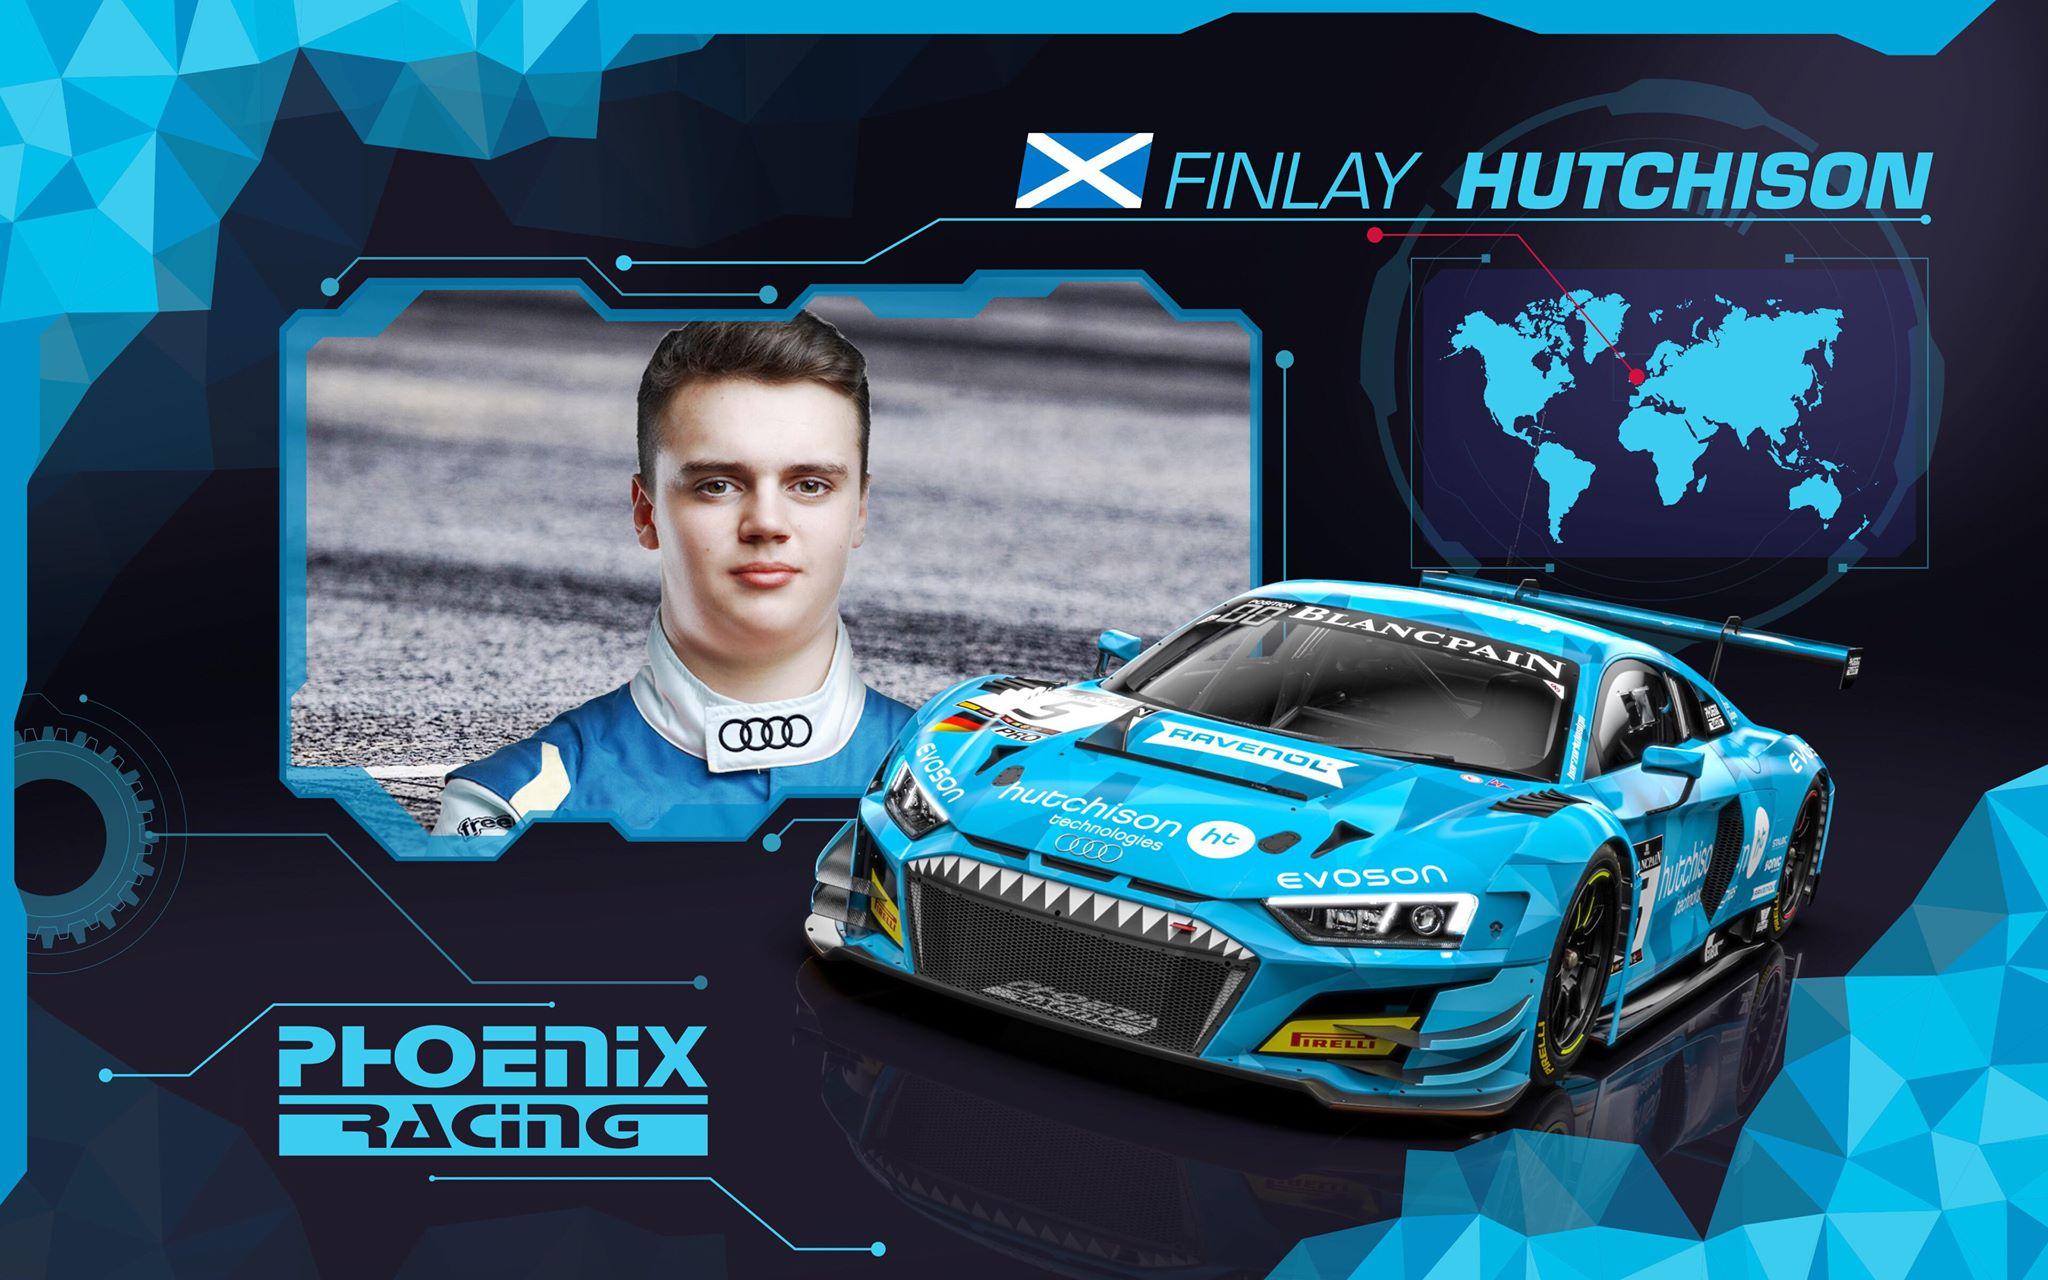 Finlay Hutchison Phoenix Racing